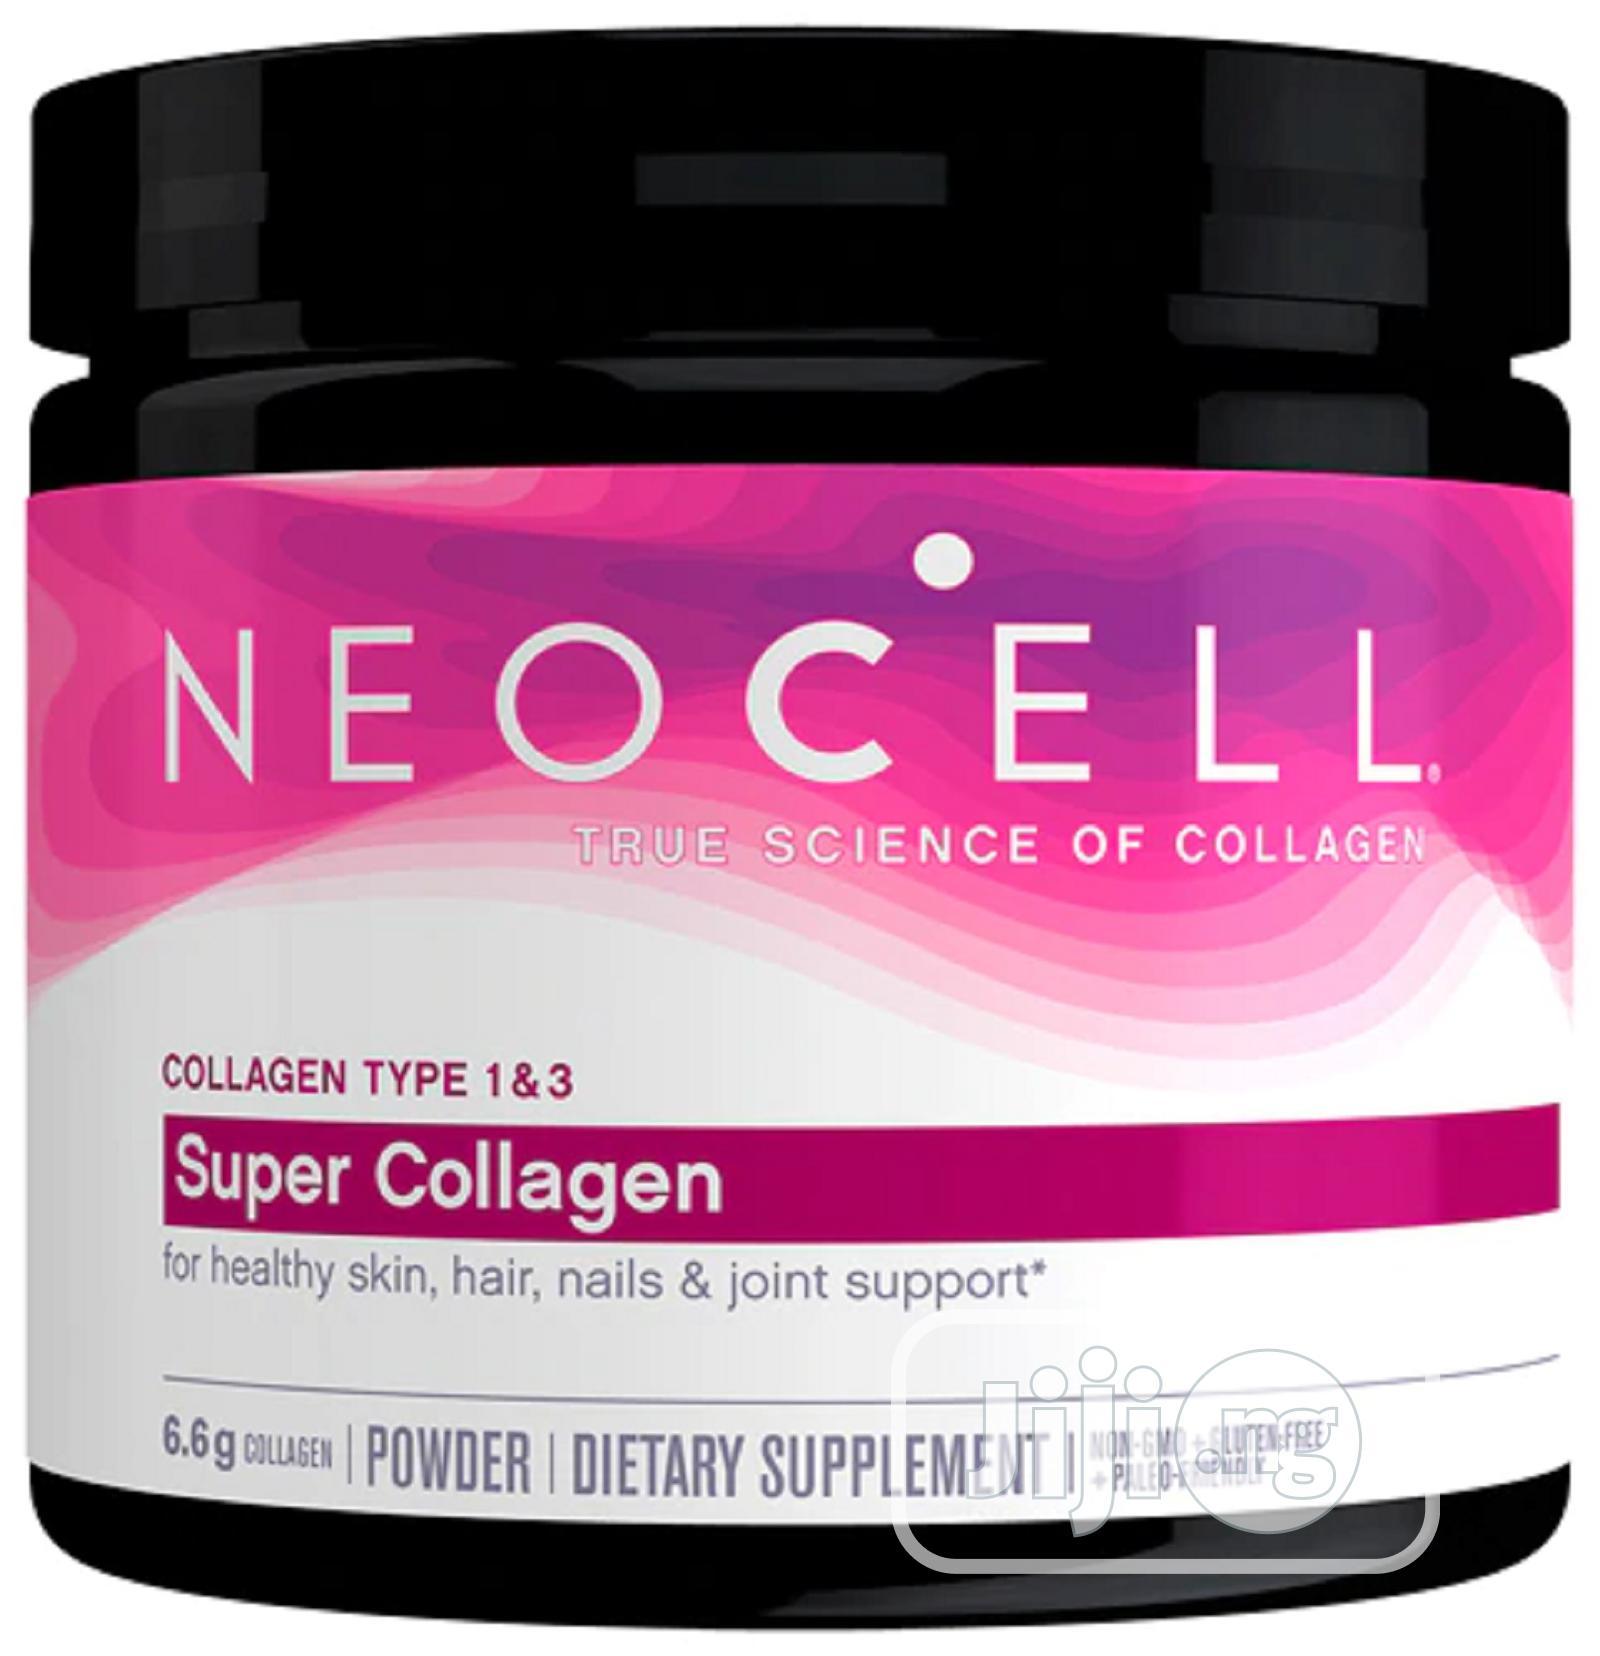 Neocell Super Collagen Powder Unflavored 6.5g